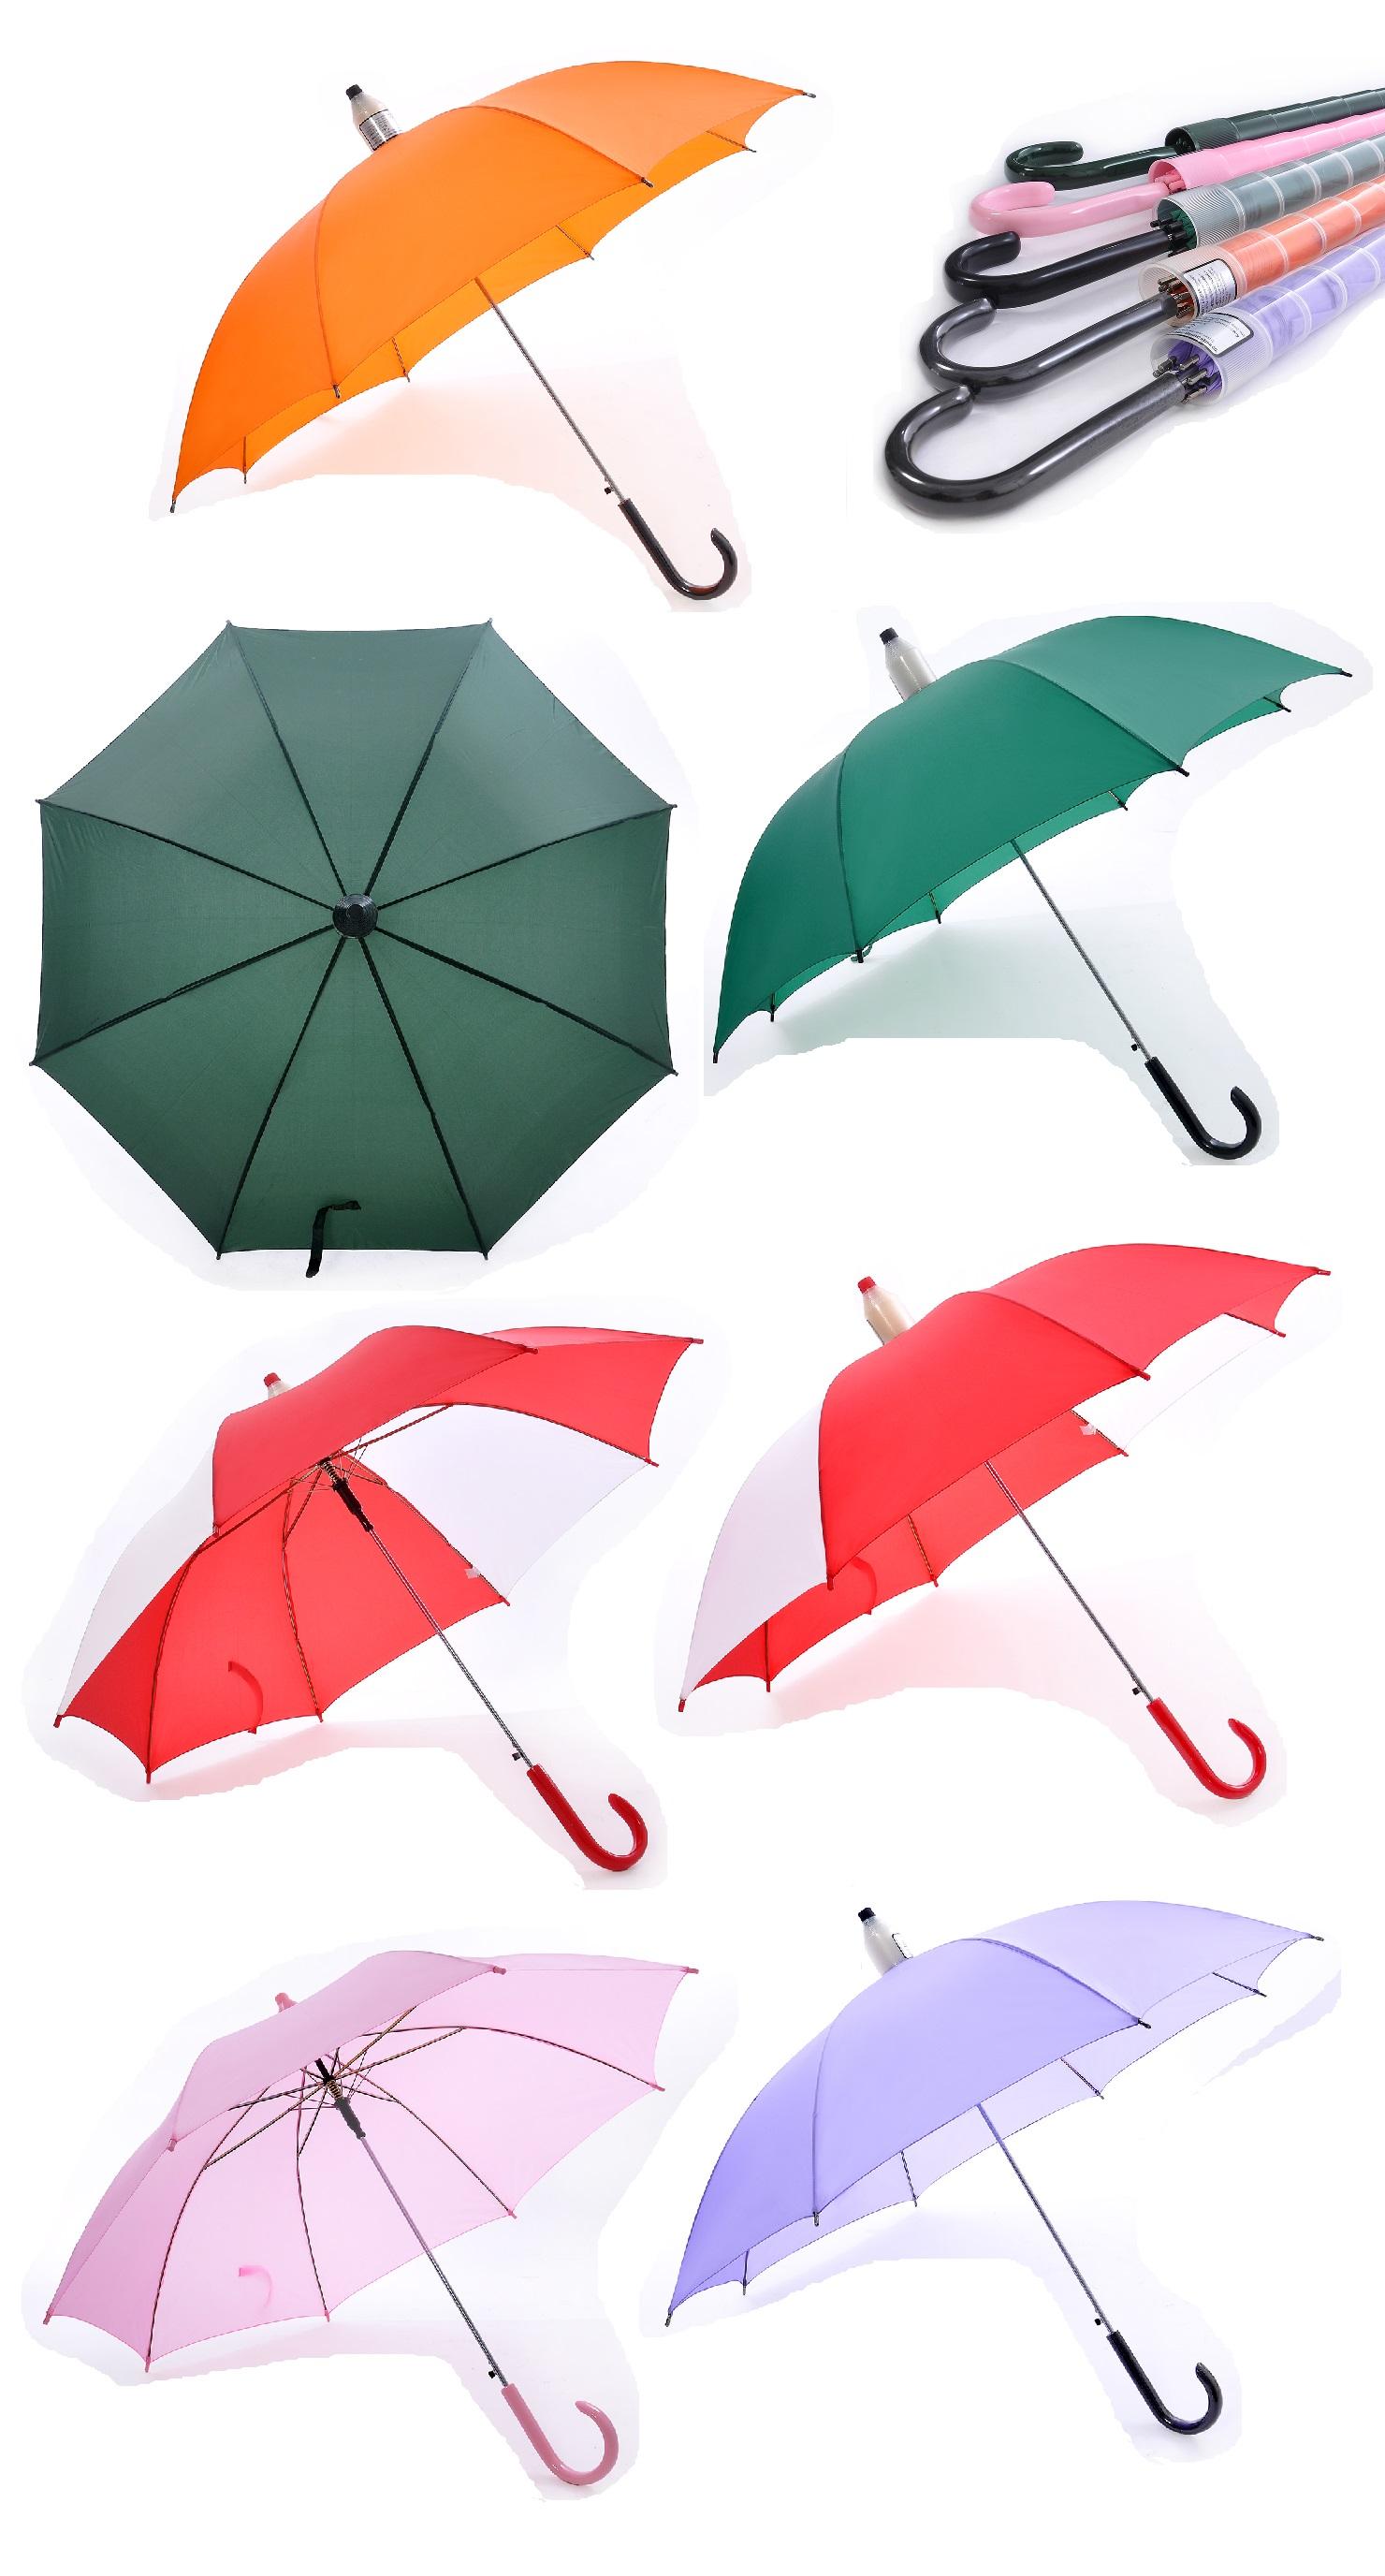 24inch Anti-Drip Umbrella